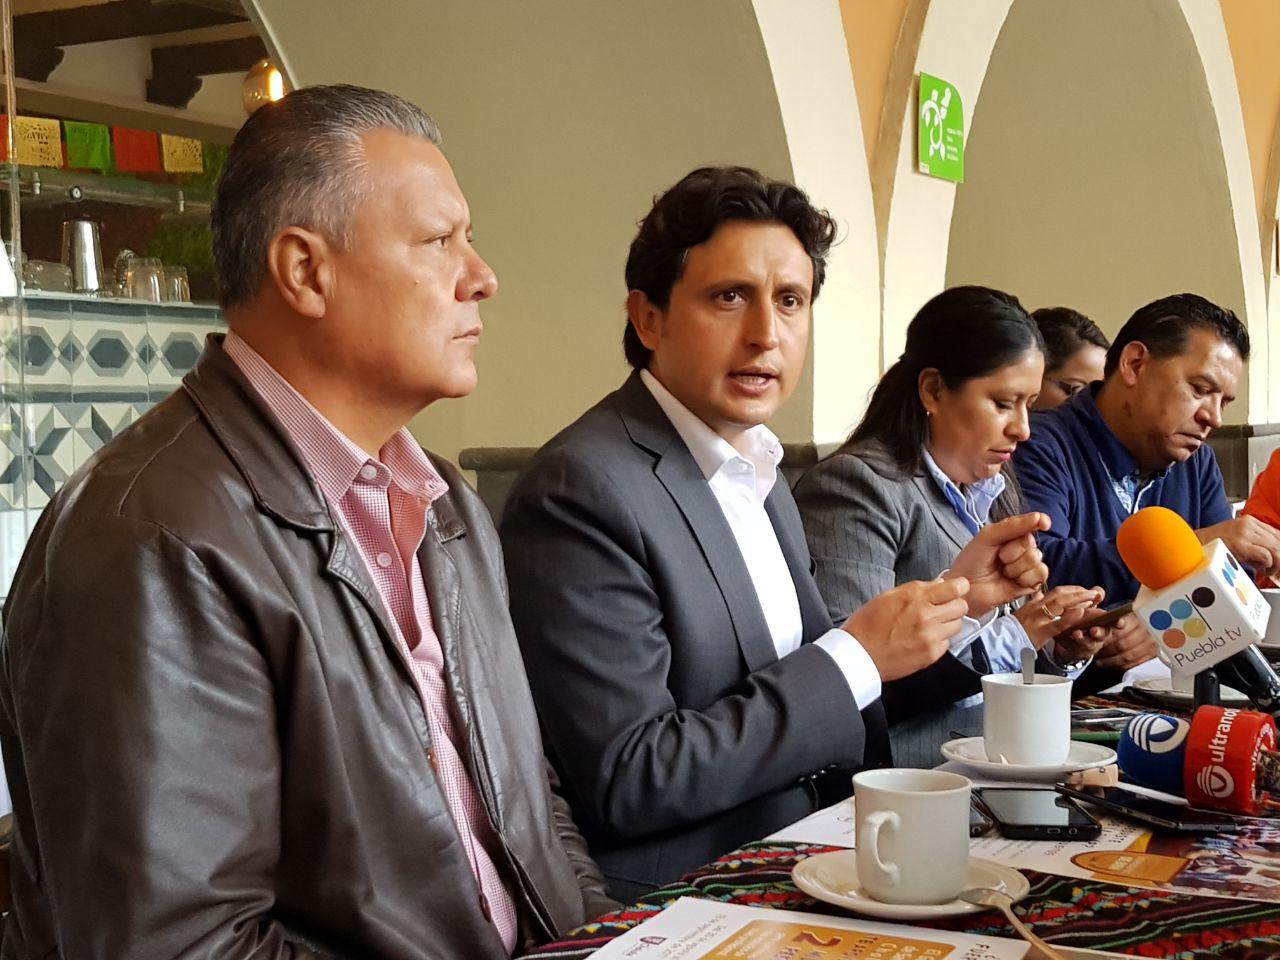 Anuncia edil de San Pedro Cholula becas para rechazados de la BUAP